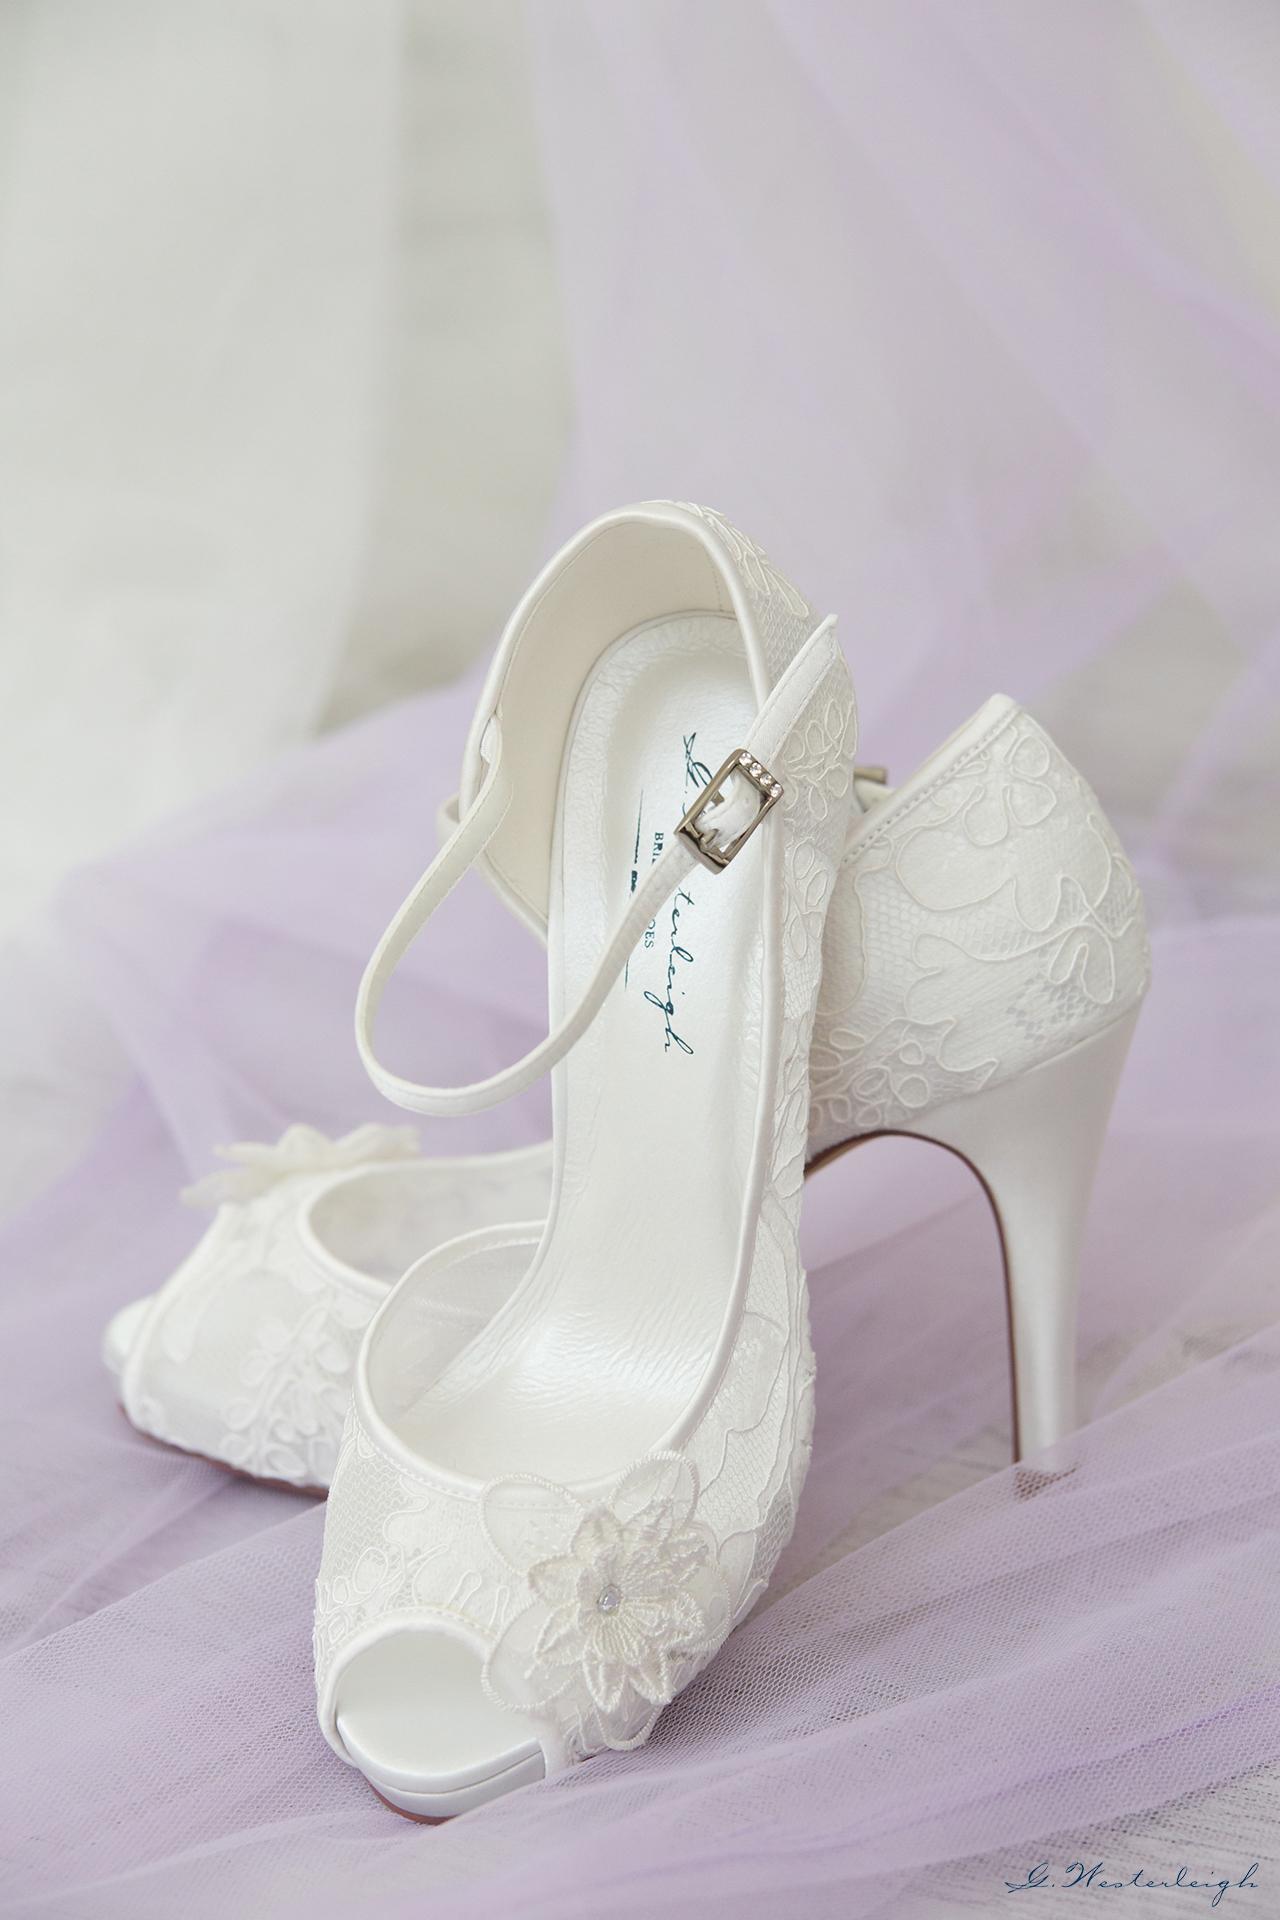 b1f3b289ed LOLA - Westerleigh cipő. 26.500 Ft. 11 cm sarok